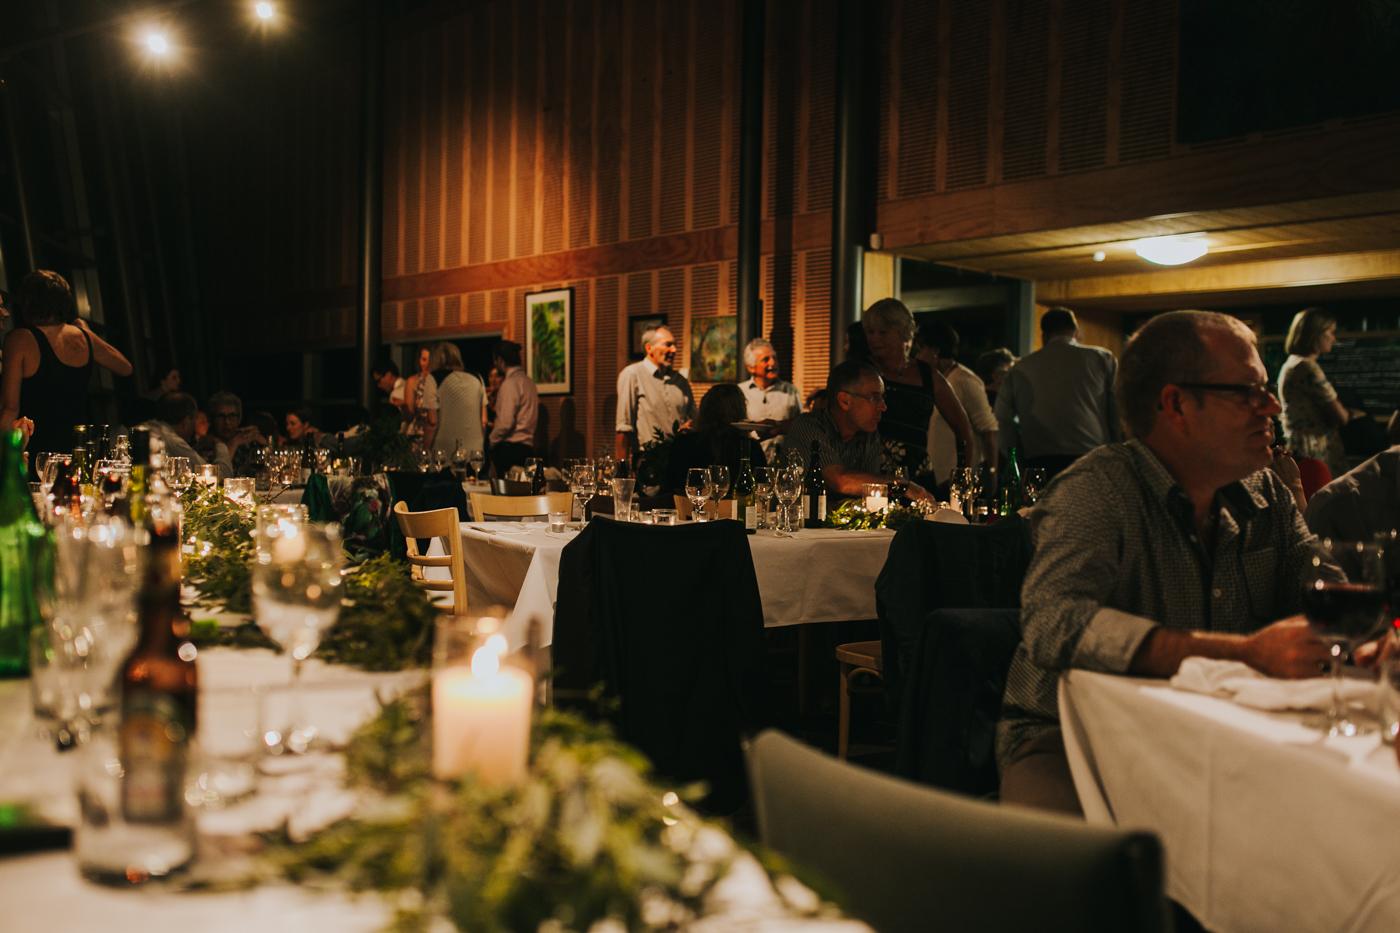 Ariana & Tim - Dunedin, New Zealand Wedding - Destination Wedding - Samantha Heather Photography-281.jpg